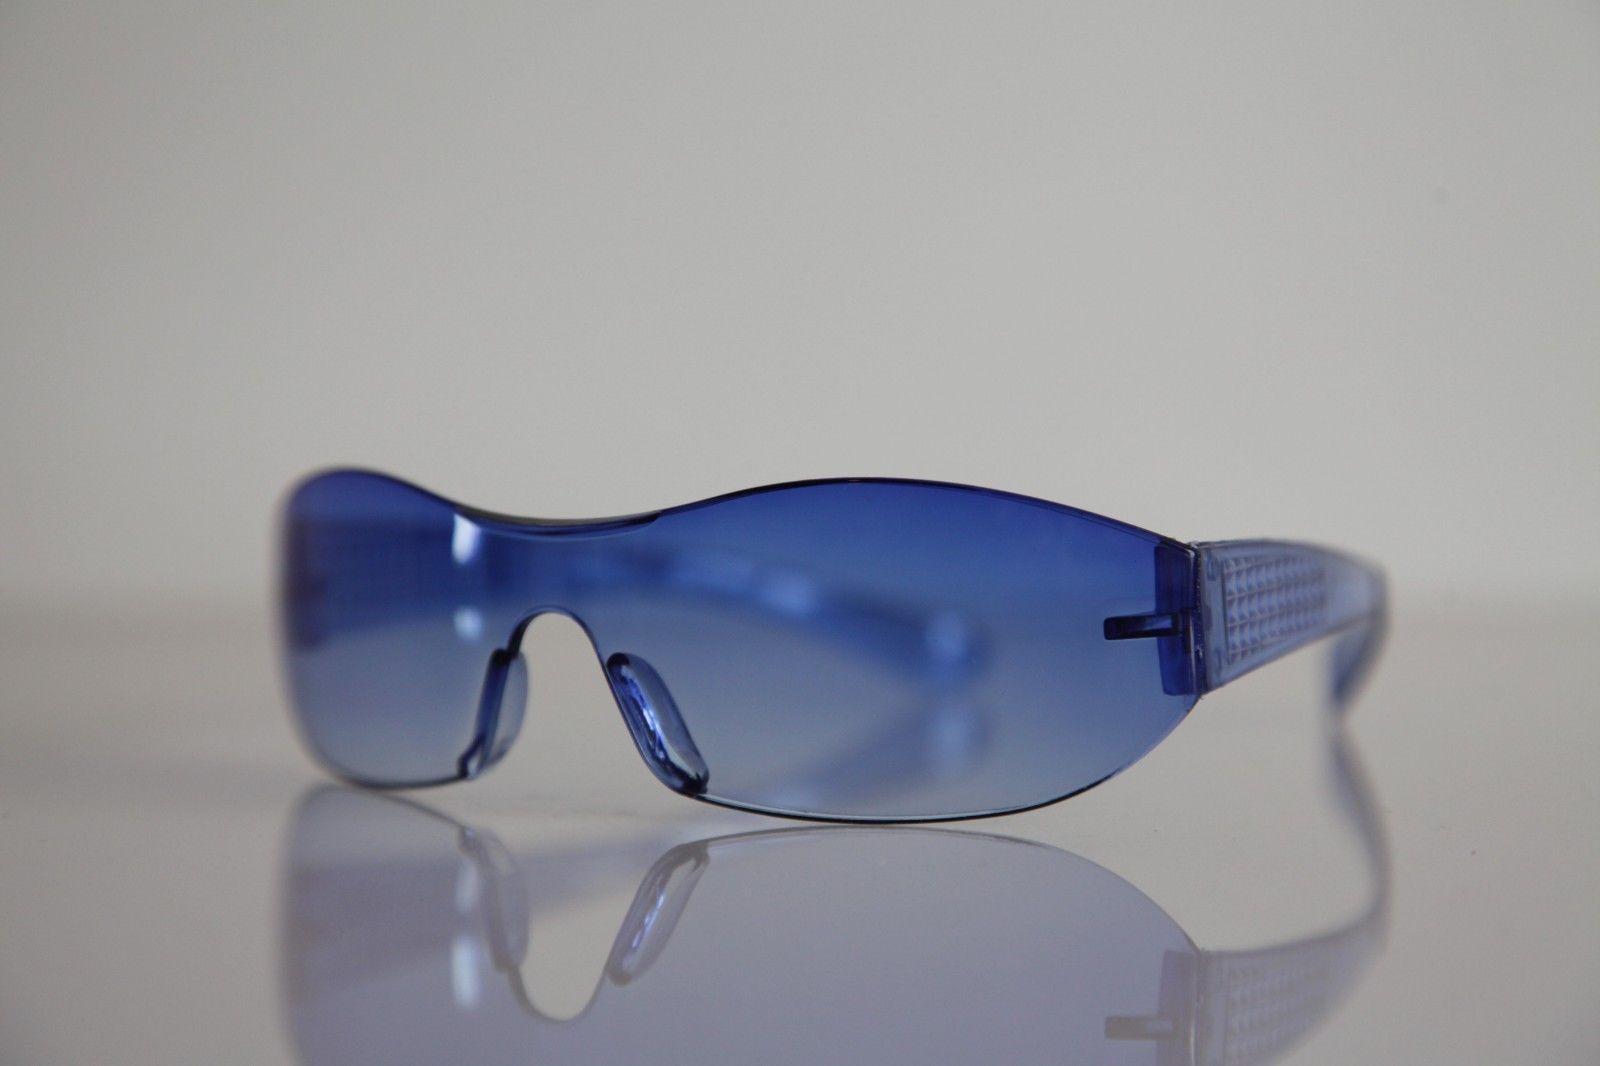 Electric Blue Rimless Sunglasses - Sunglasses